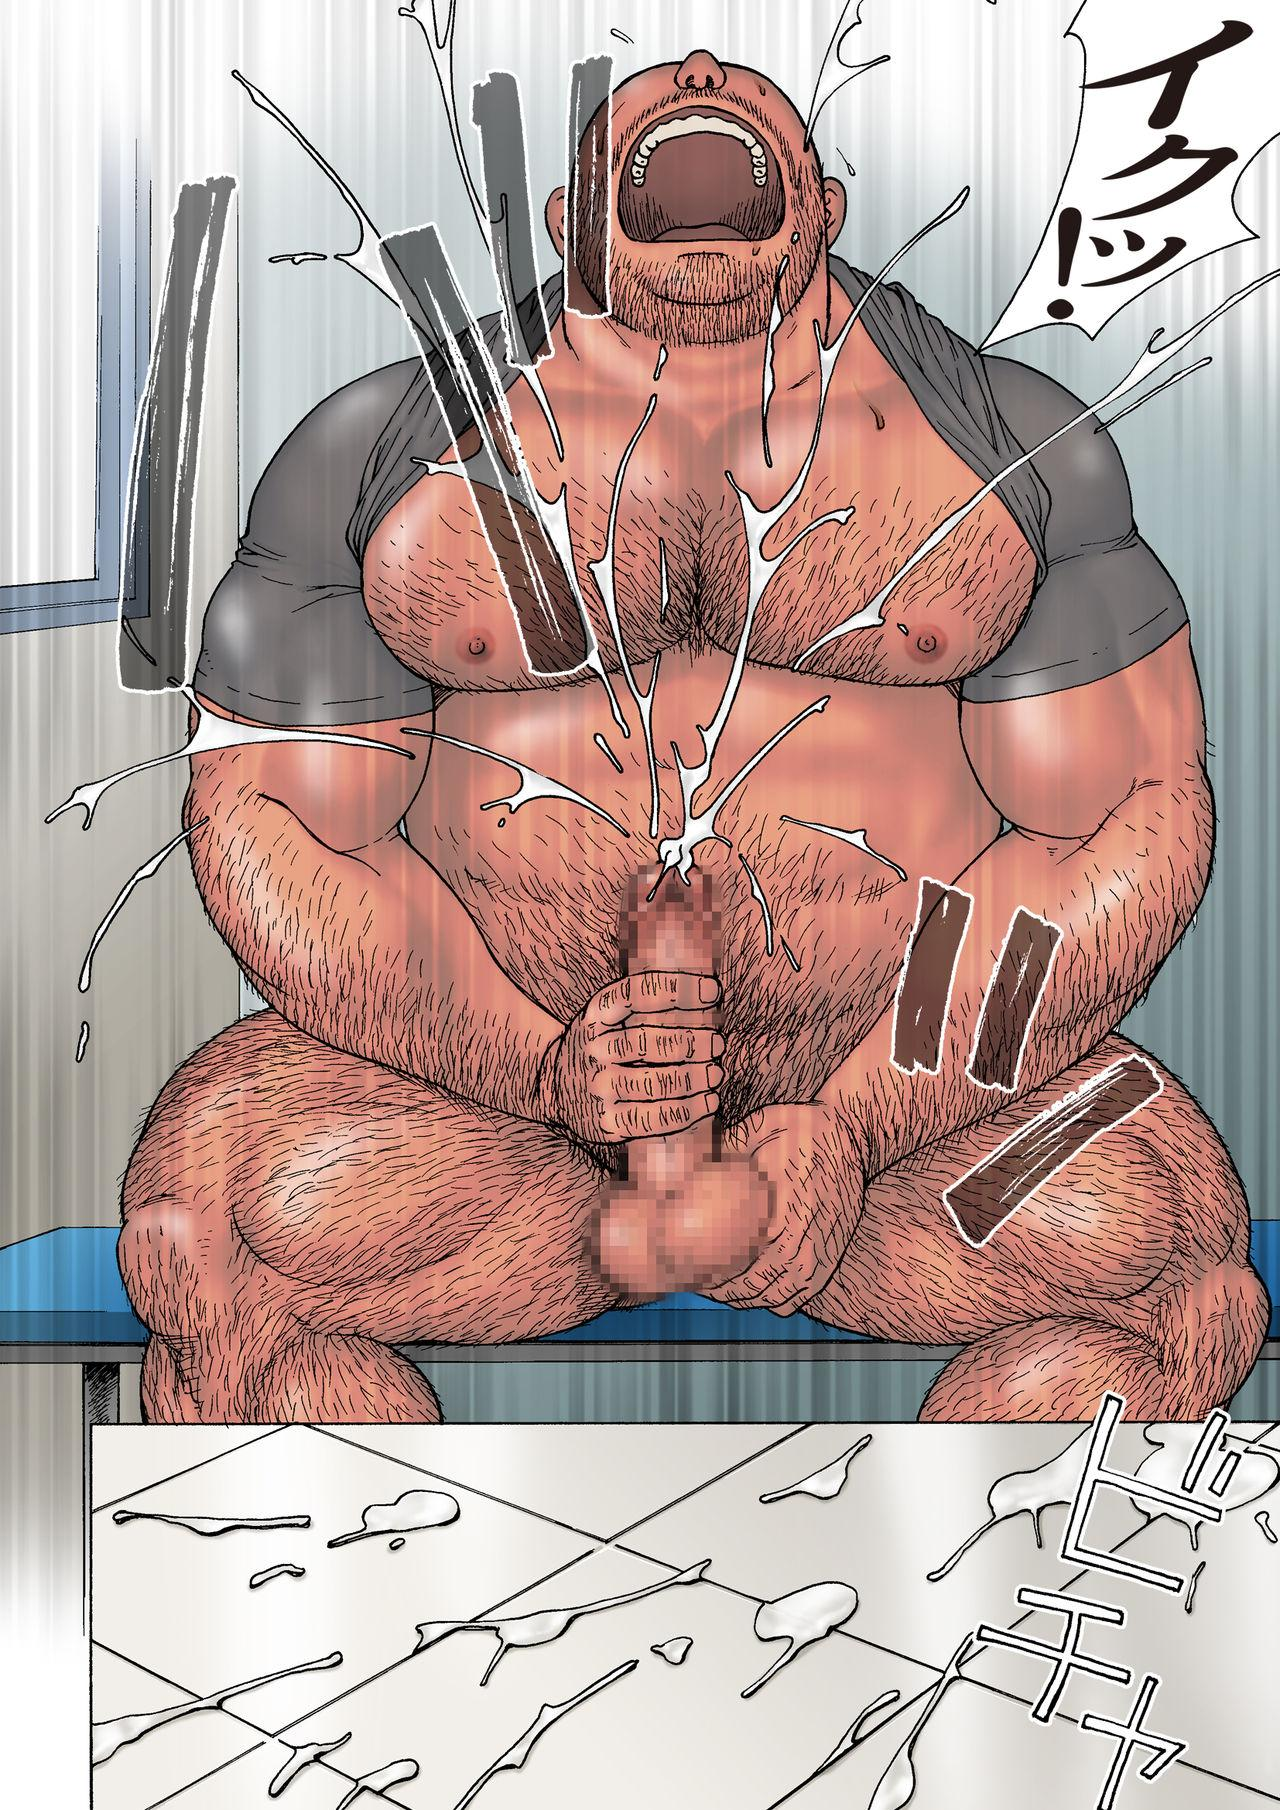 Danshi Koukousei Weightlifter Shiai-chuu, Osae kirenai Wakai Takeri 25